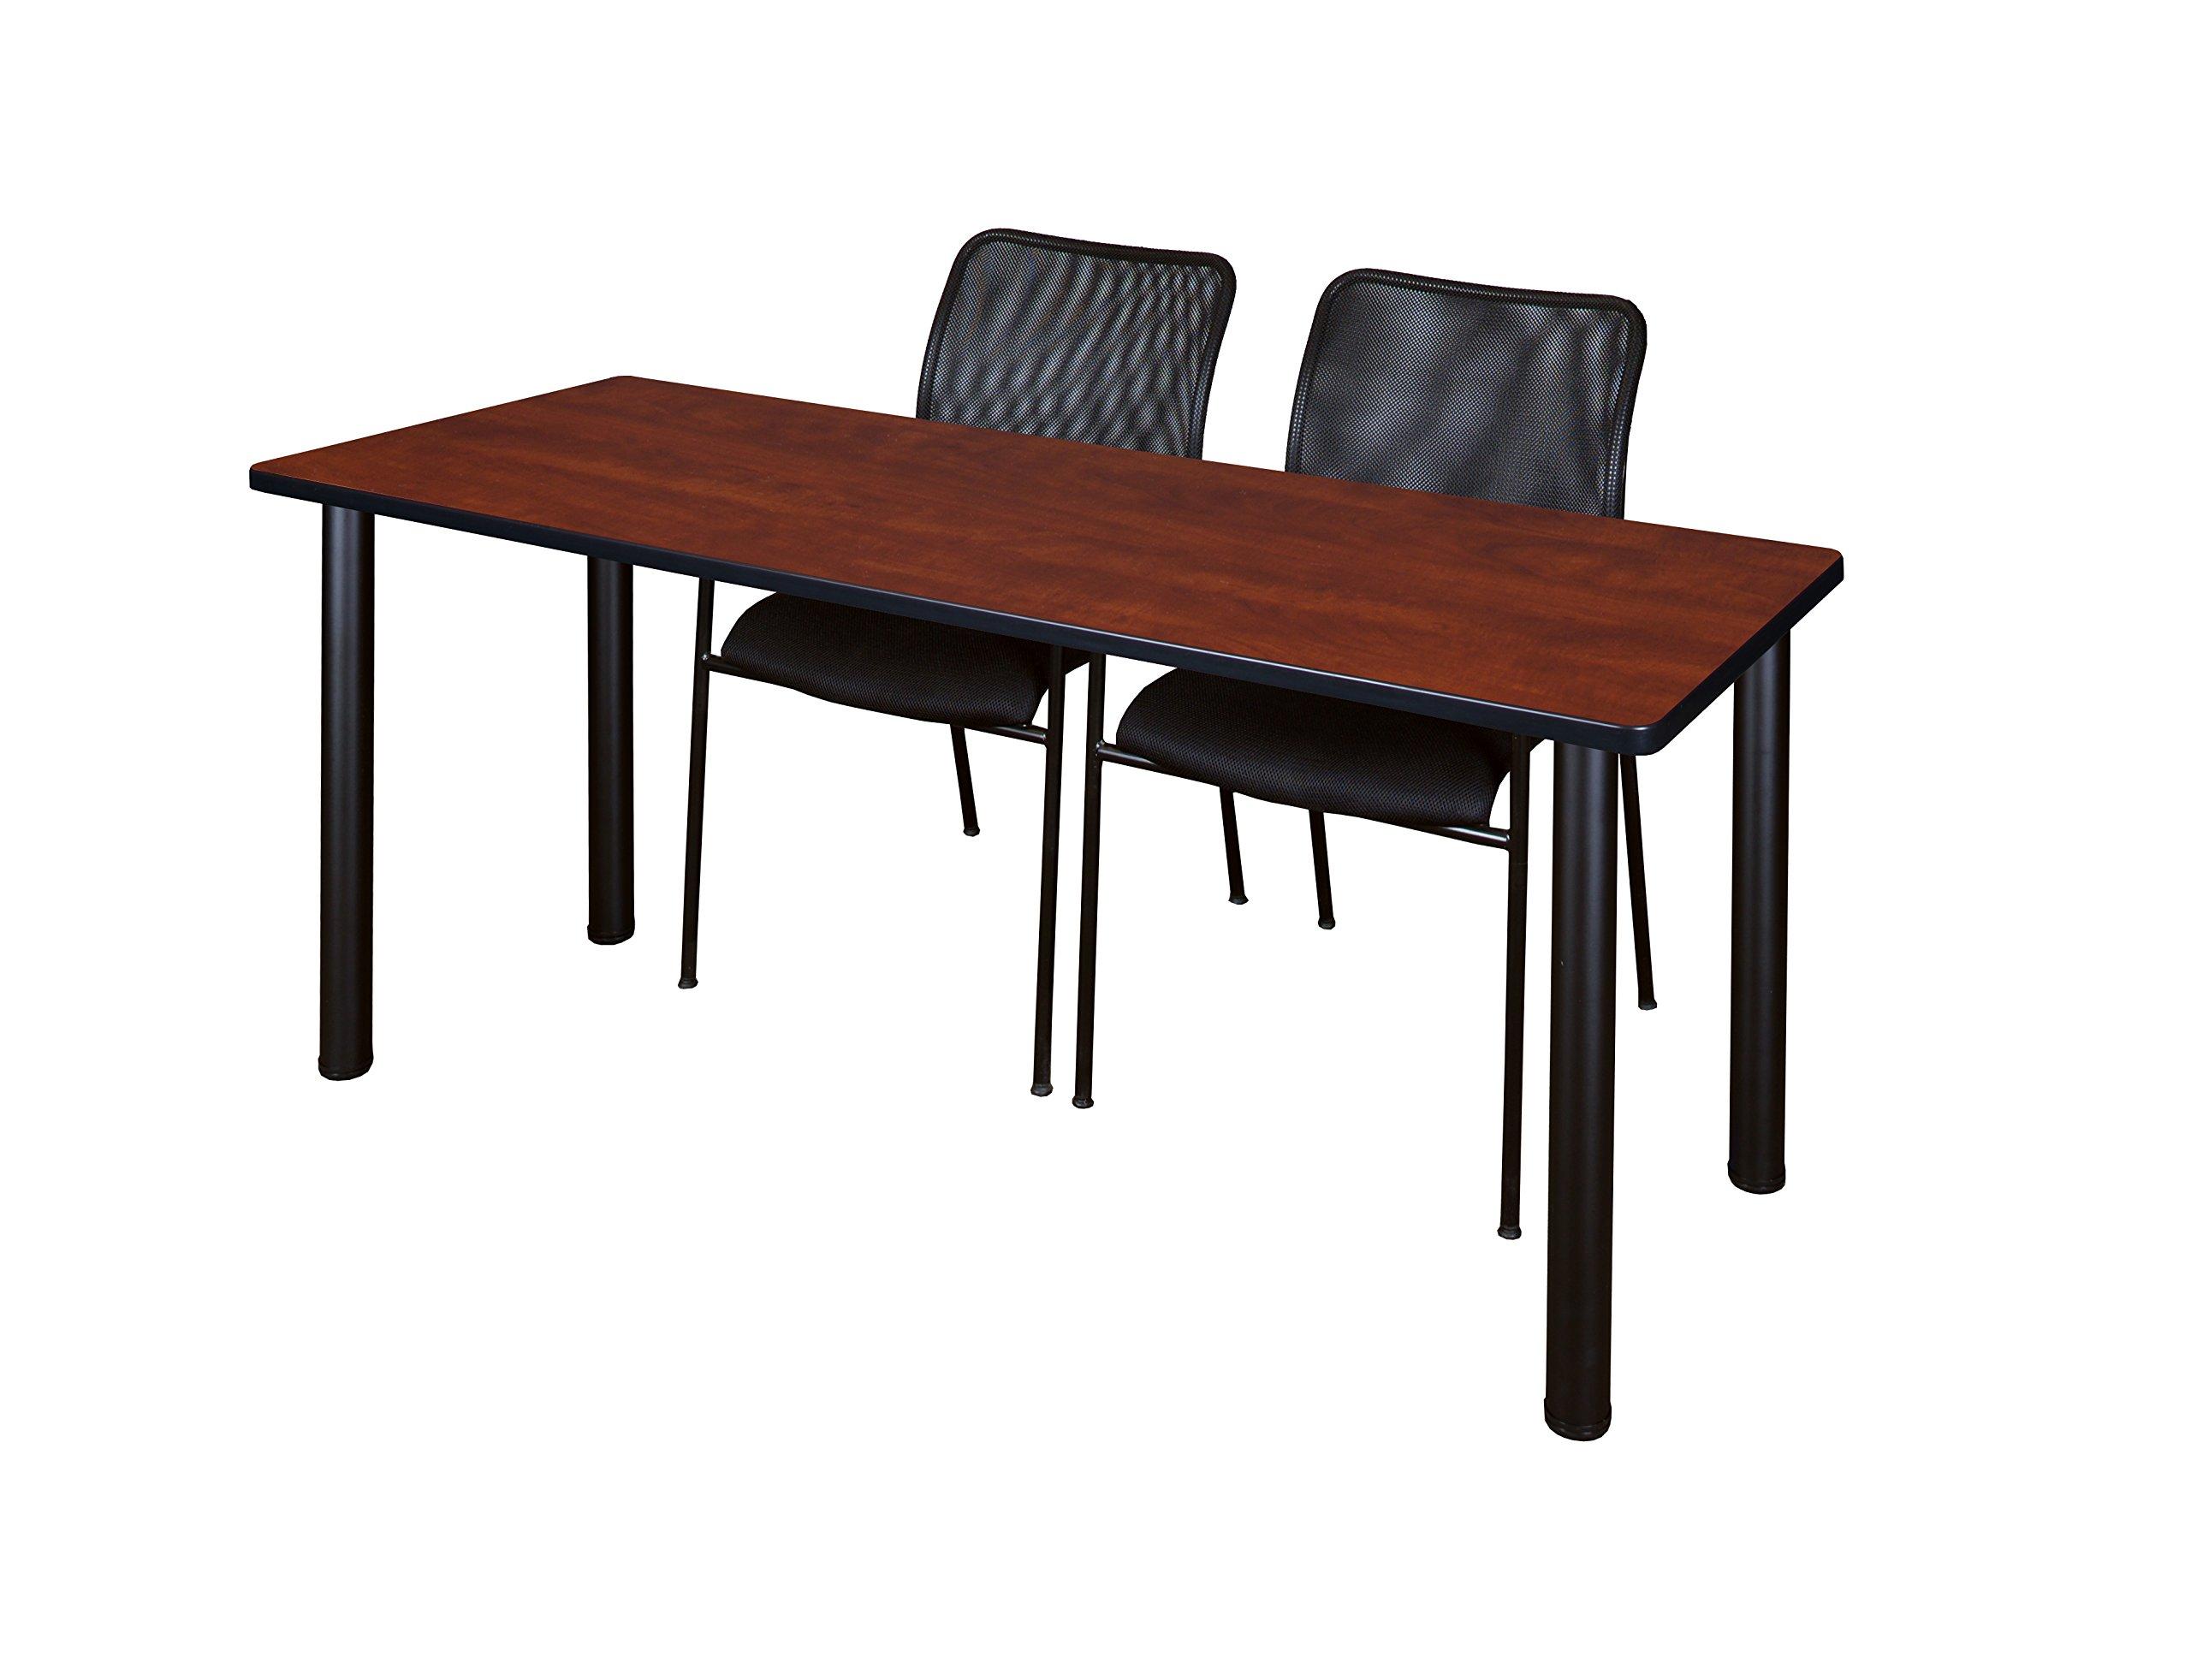 Regency MT7224CHBPBK75BK Kee Training Table Set with 2 Mario Chairs 72'' x 24'' Cherry/Black